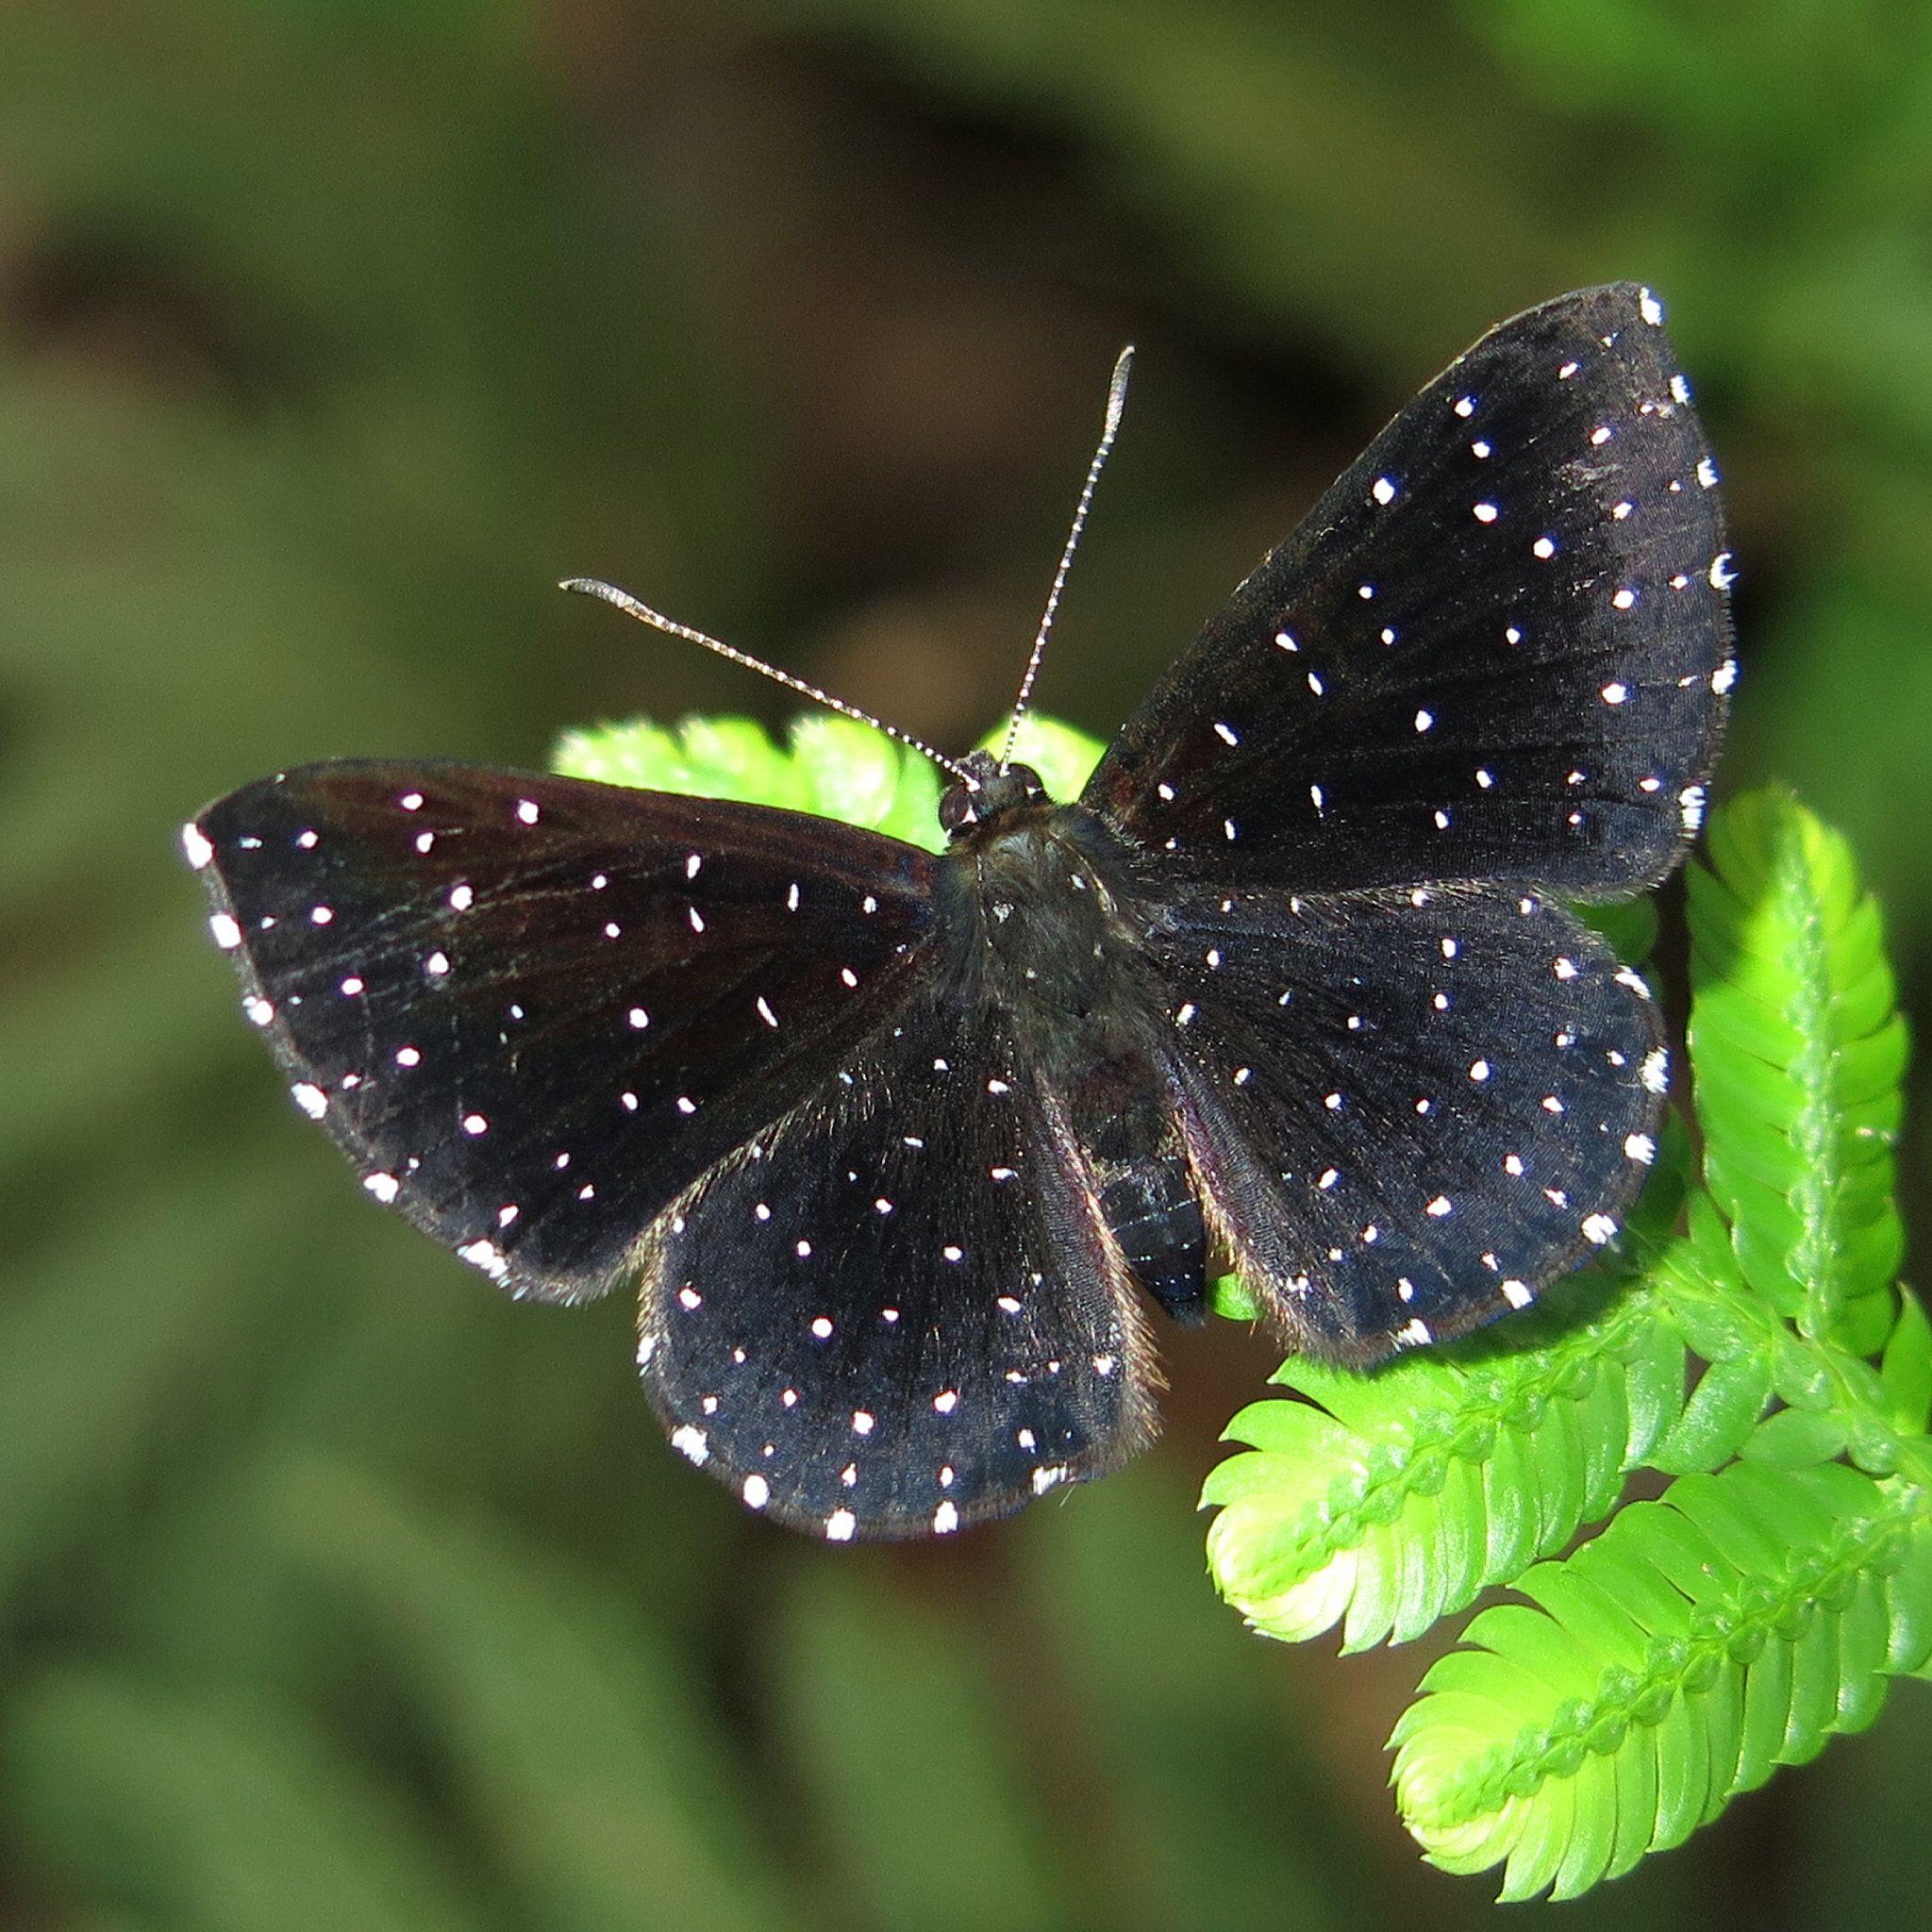 https://flic.kr/p/qBZXaY | Echydna punctata - Starry Metalmark | A common forest species in Ecuador, but still well worth photographing.